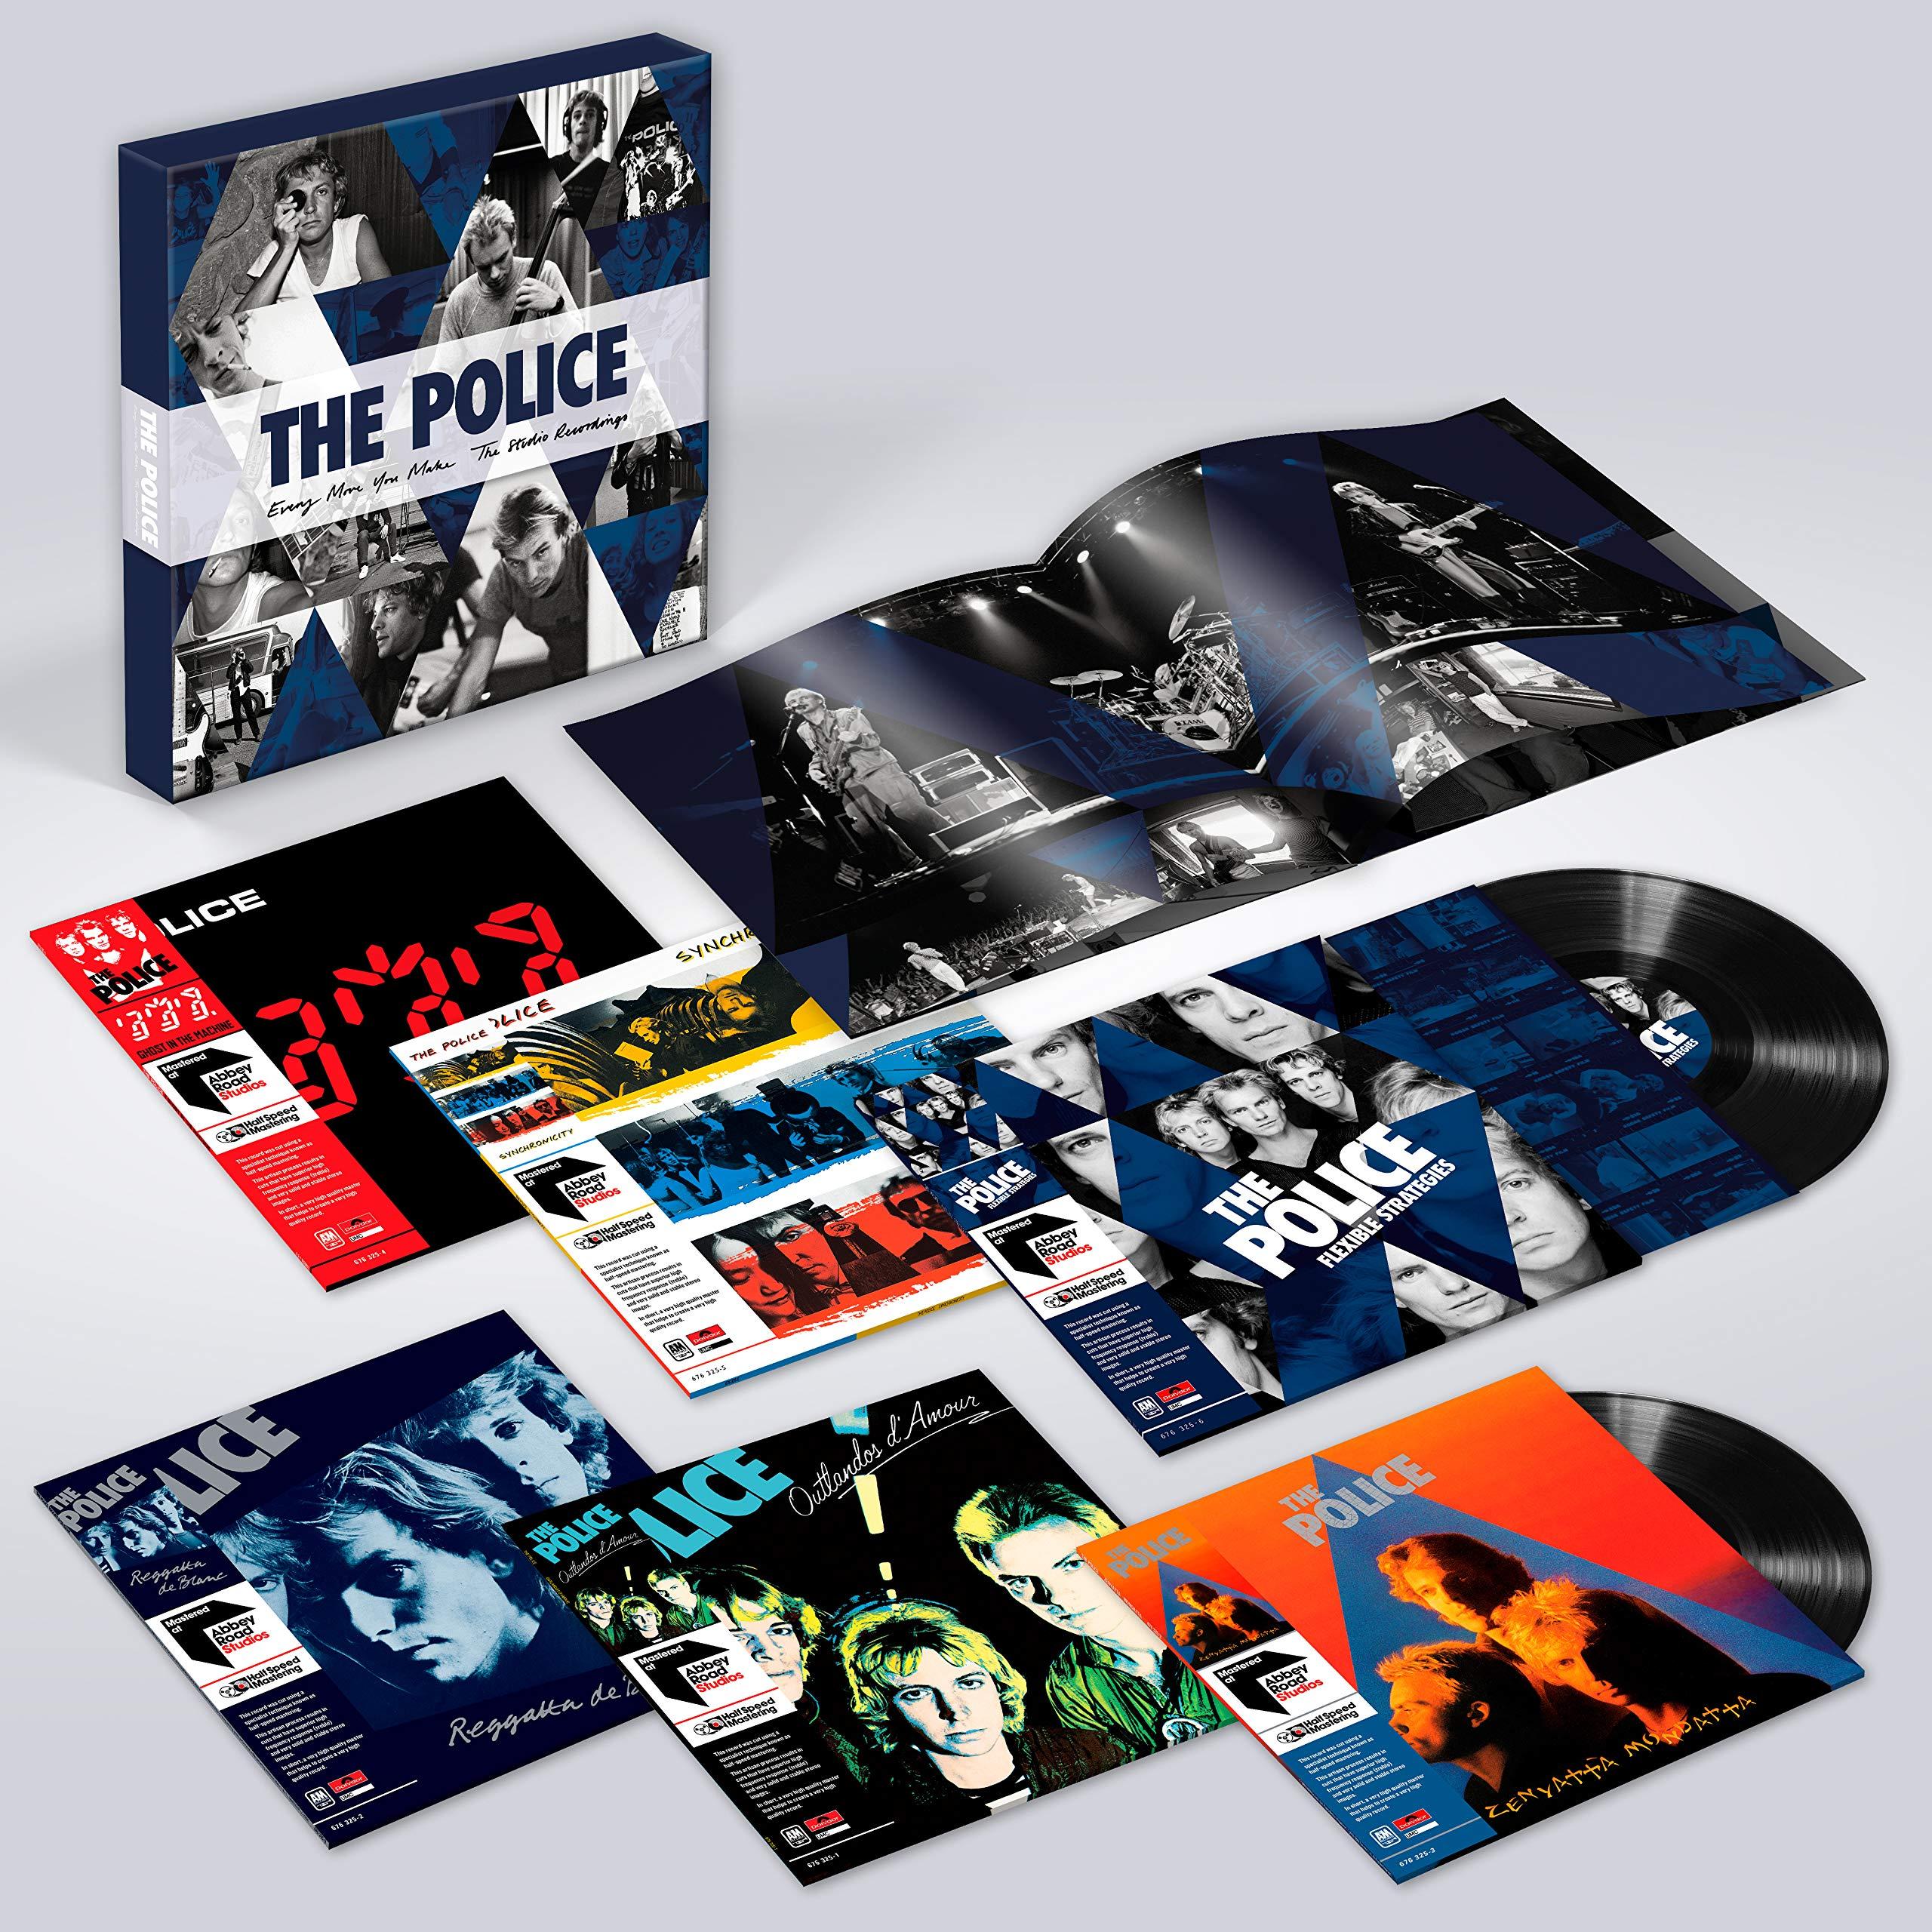 Vinilo : The Police - Every Move You Make: The Studio Recordings (180 Gram Vinyl)